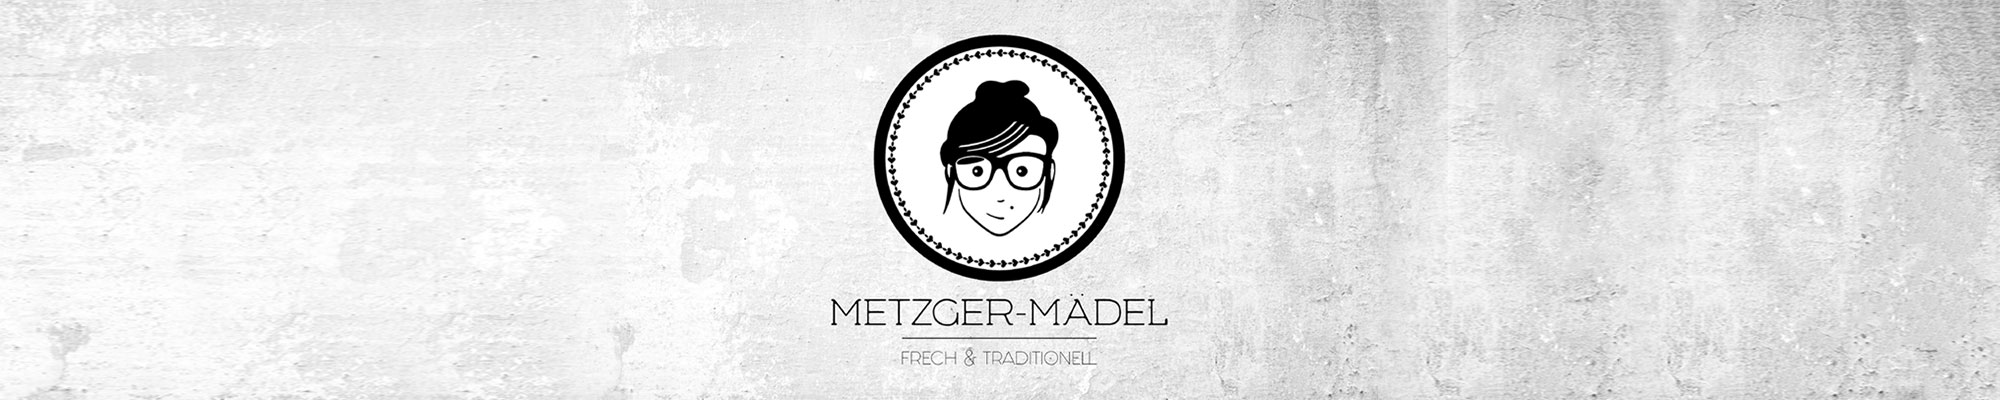 verpackungsdesign Edeka Metzger Mädel Logo als Header für die Food & Co Foodagentur Website